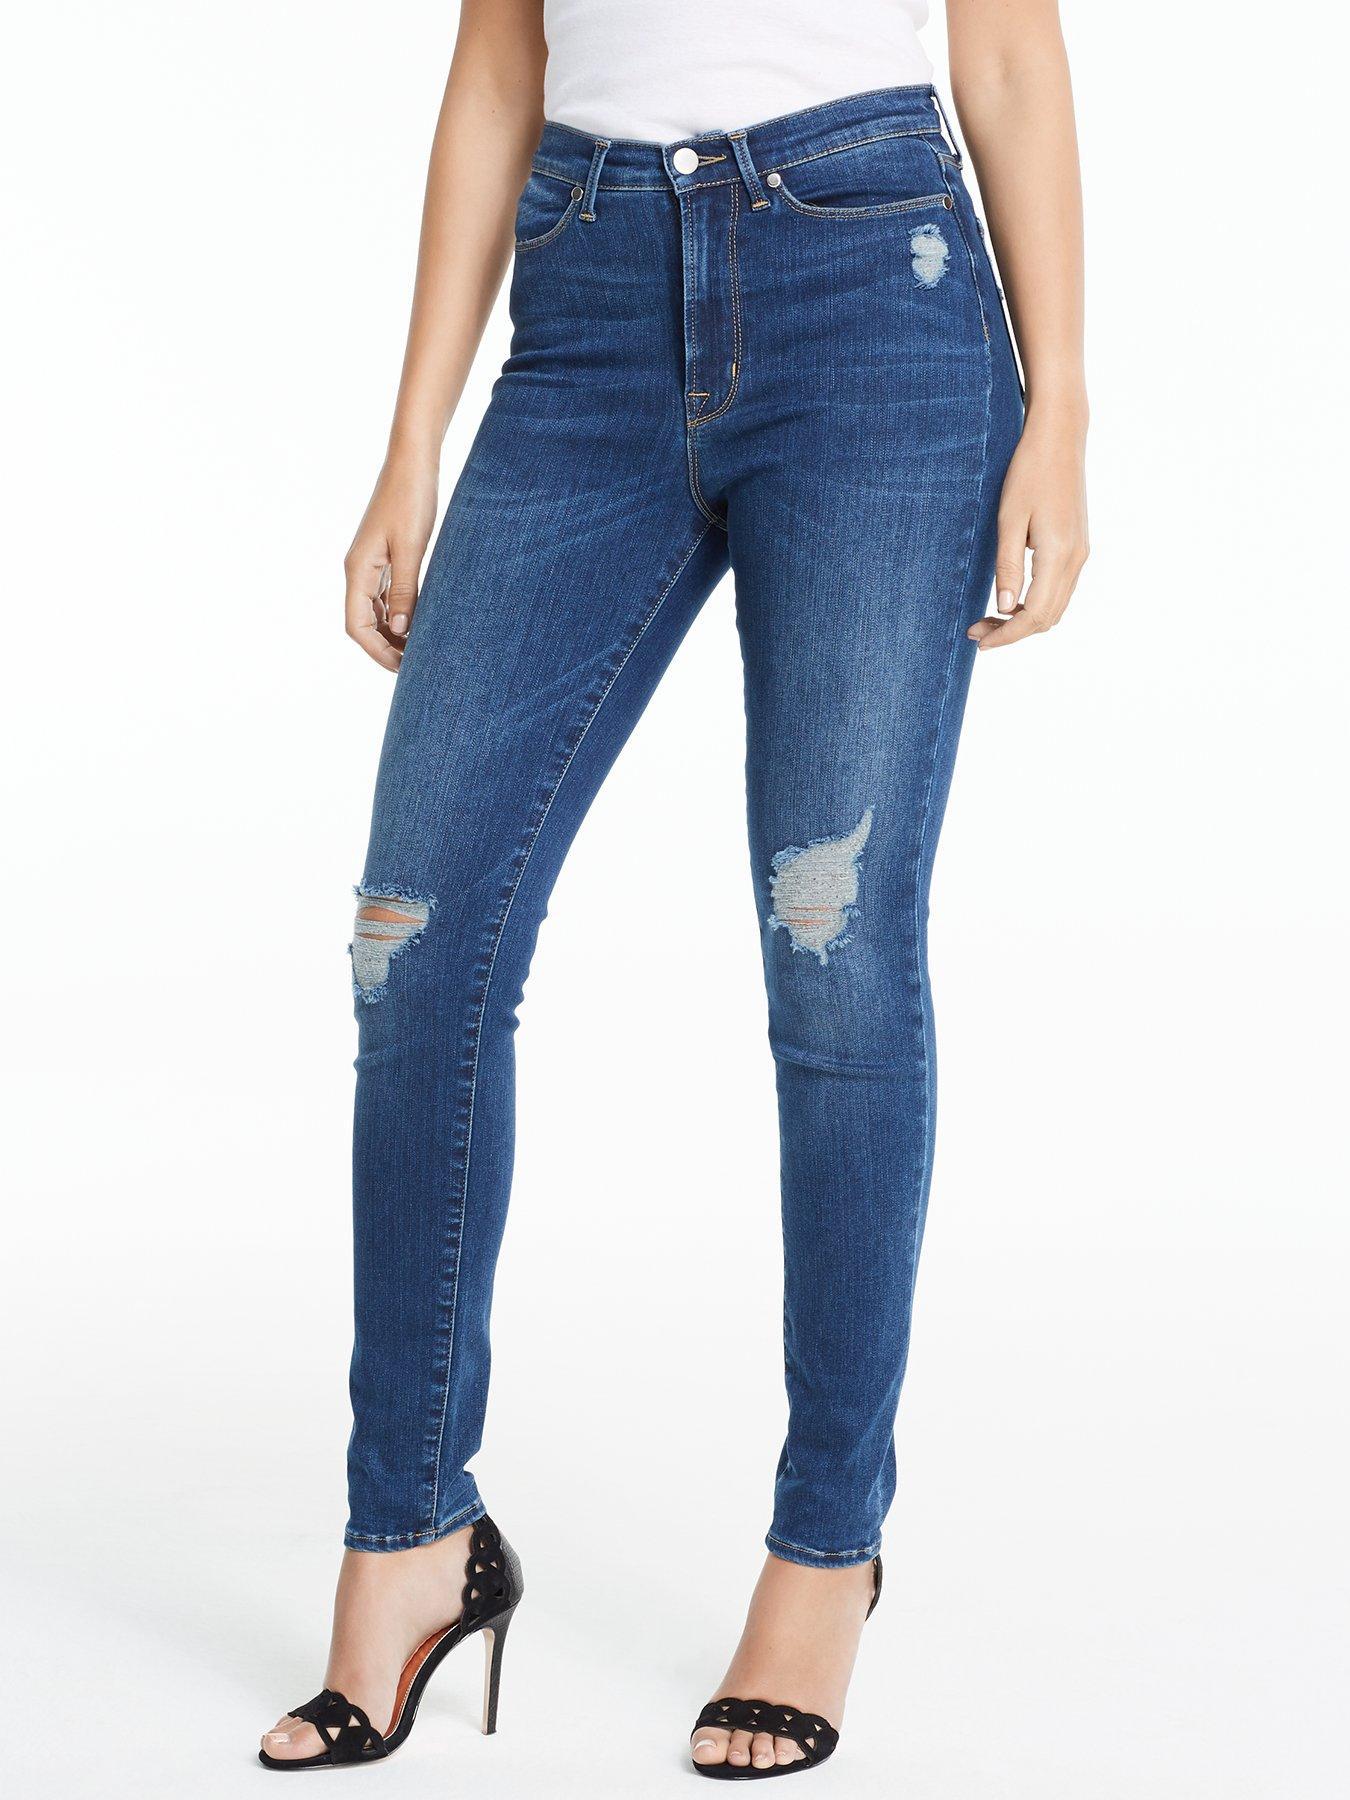 Michelle Keegan Premium Skinny Jean yqv39457